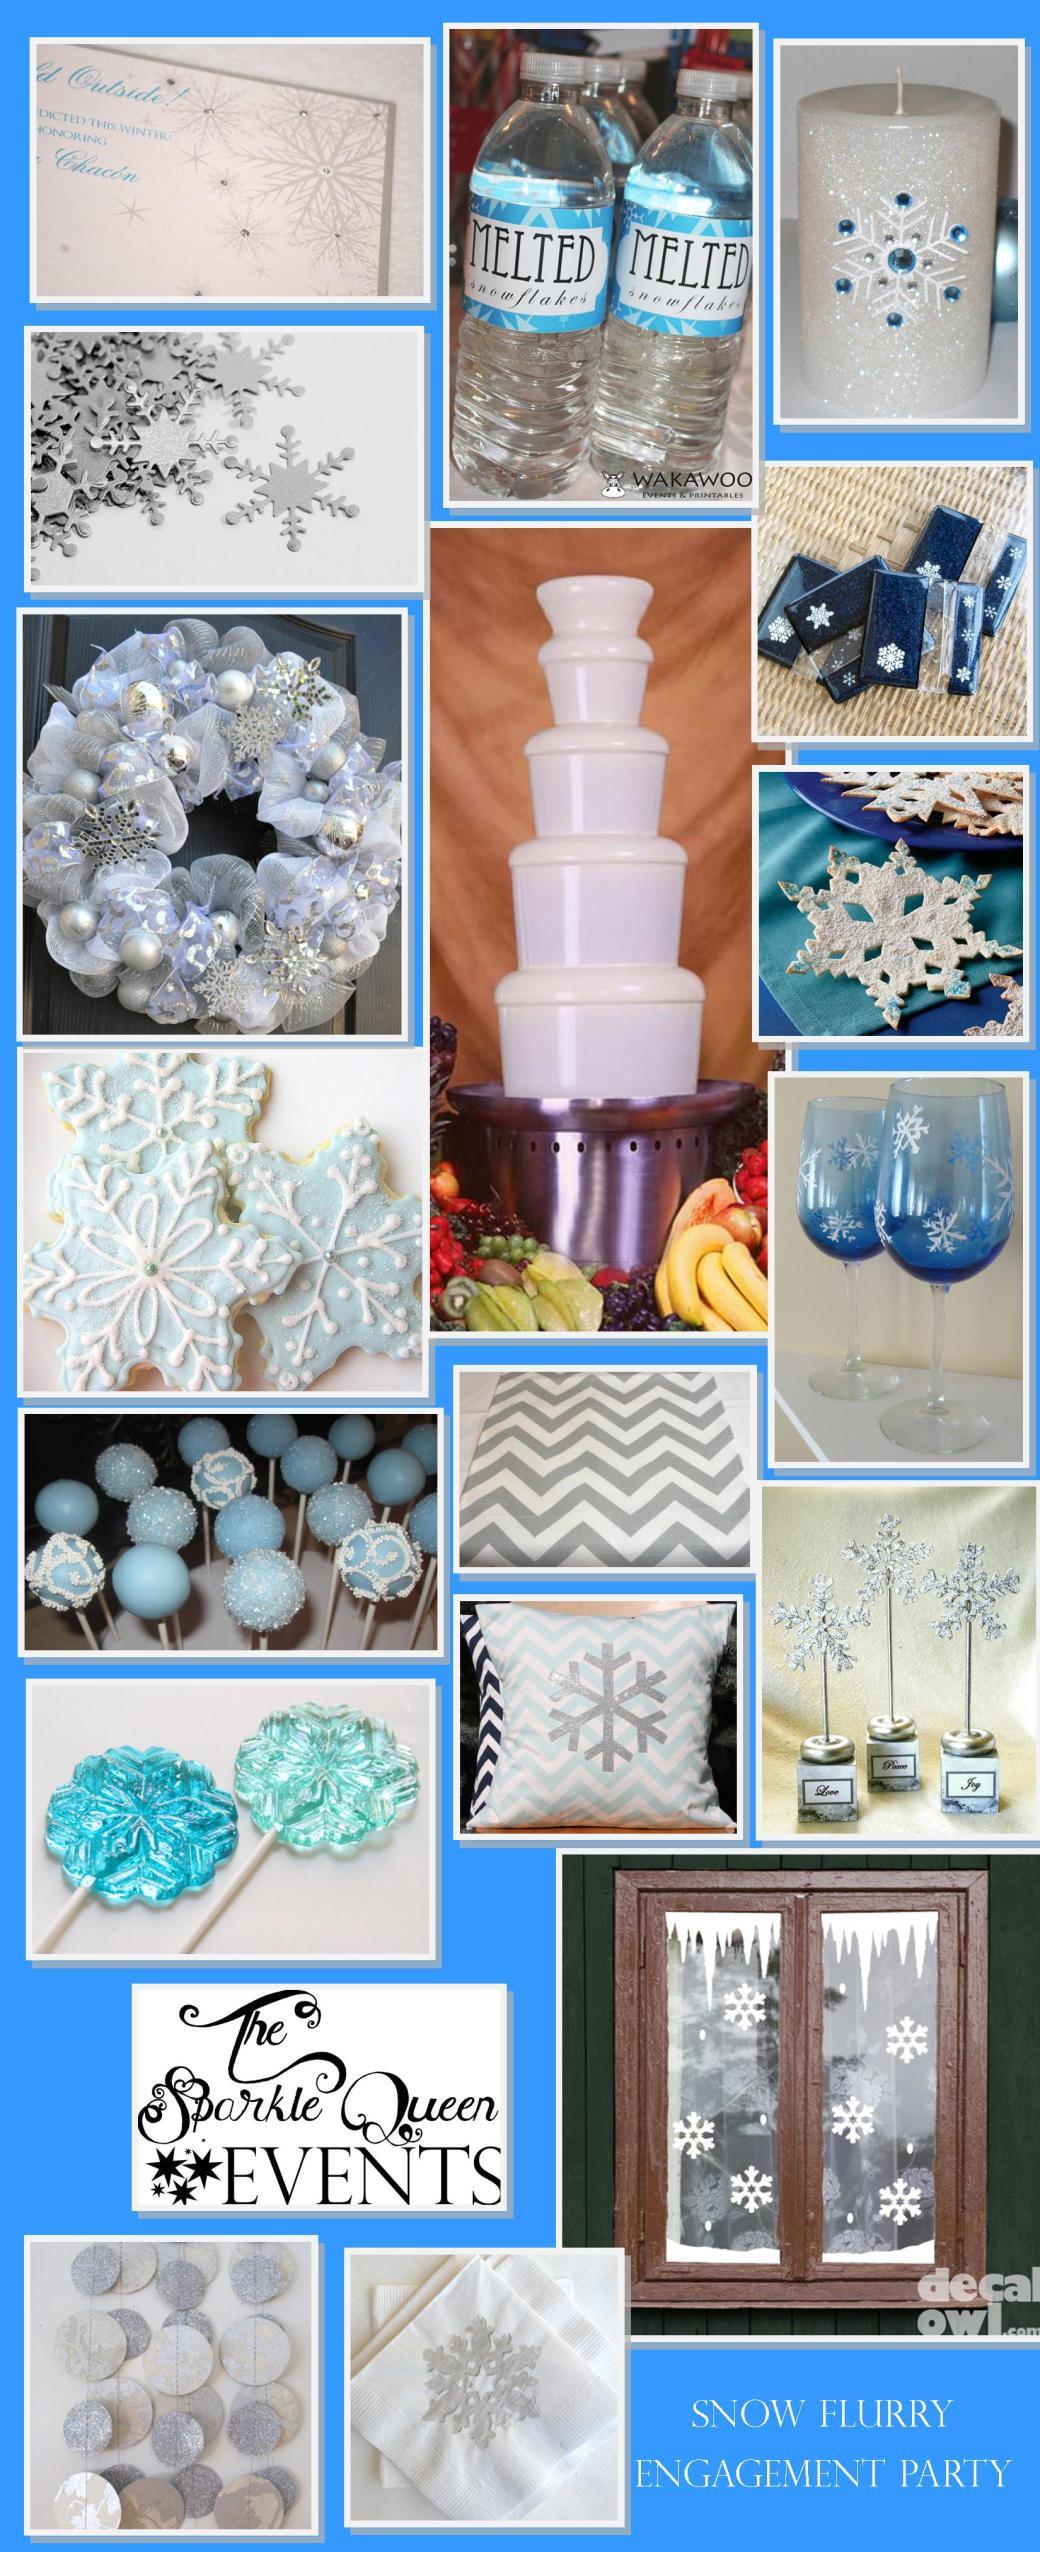 Snow Flurry Engagement Party